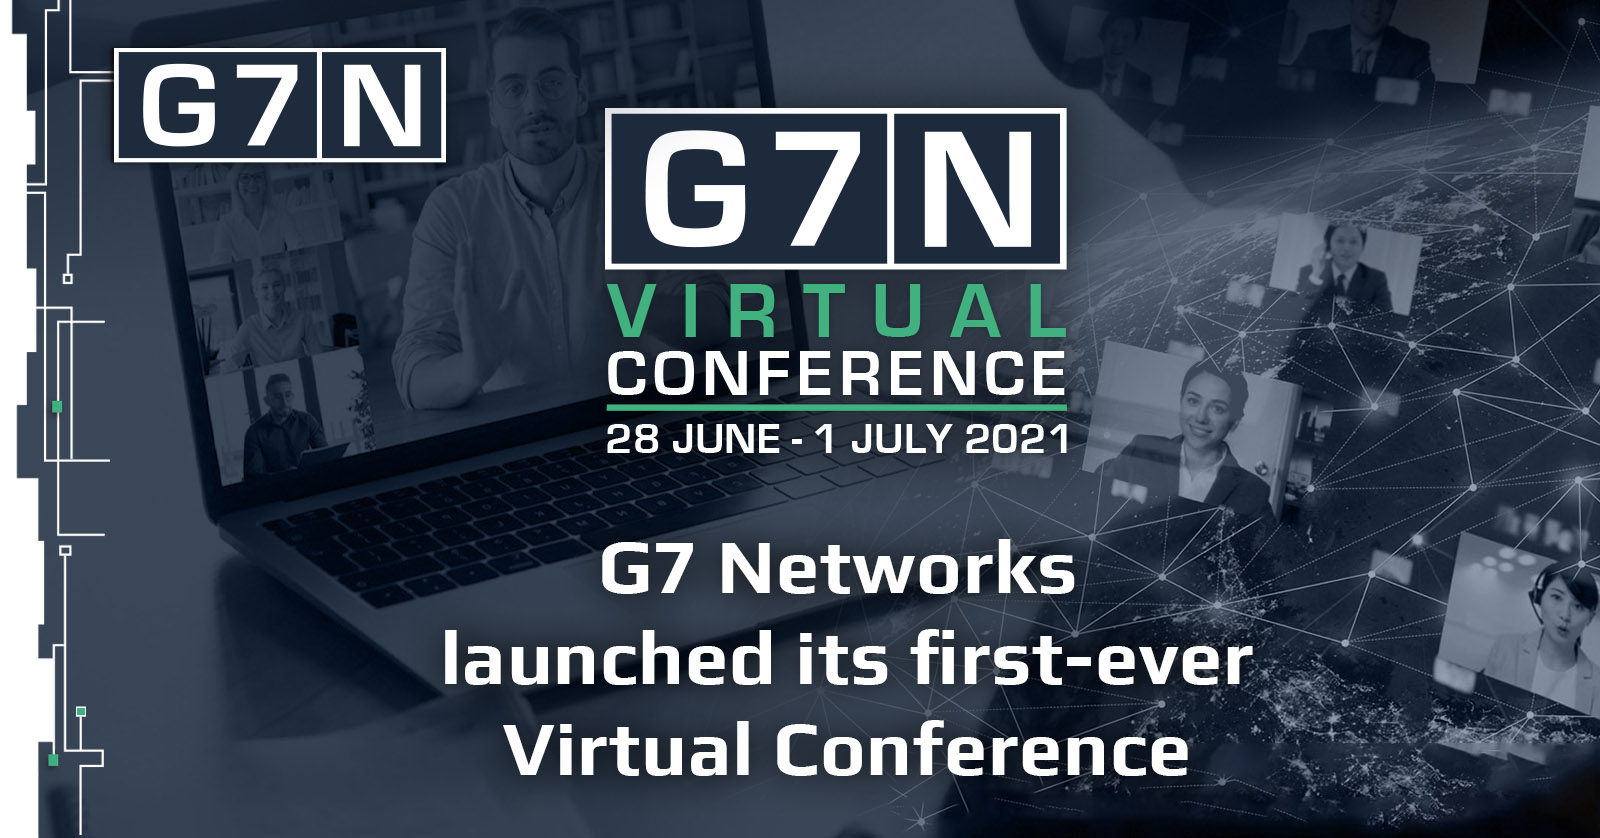 https://newg7dashboard.g7networks.com/news/news__280621_G7N_virtual_NEWS.jpg